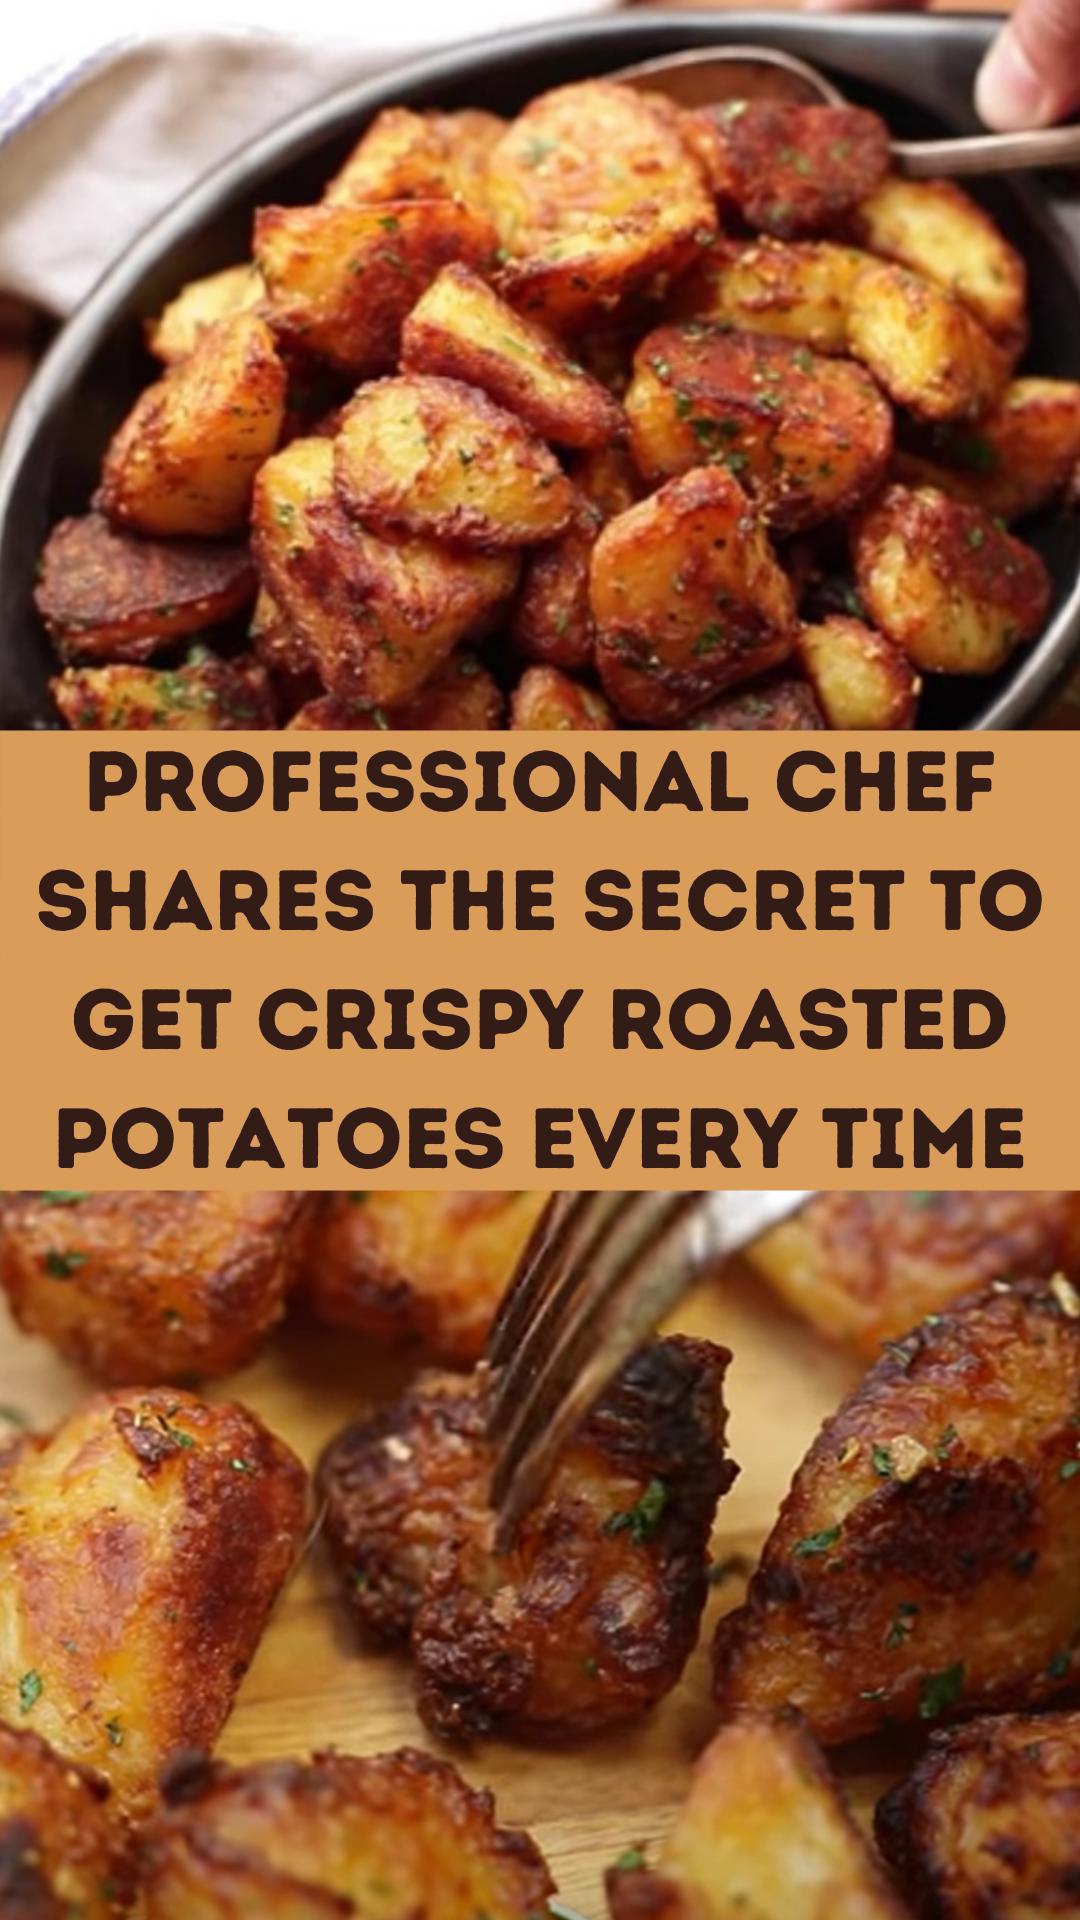 Professional chef shares the secret to get crispy